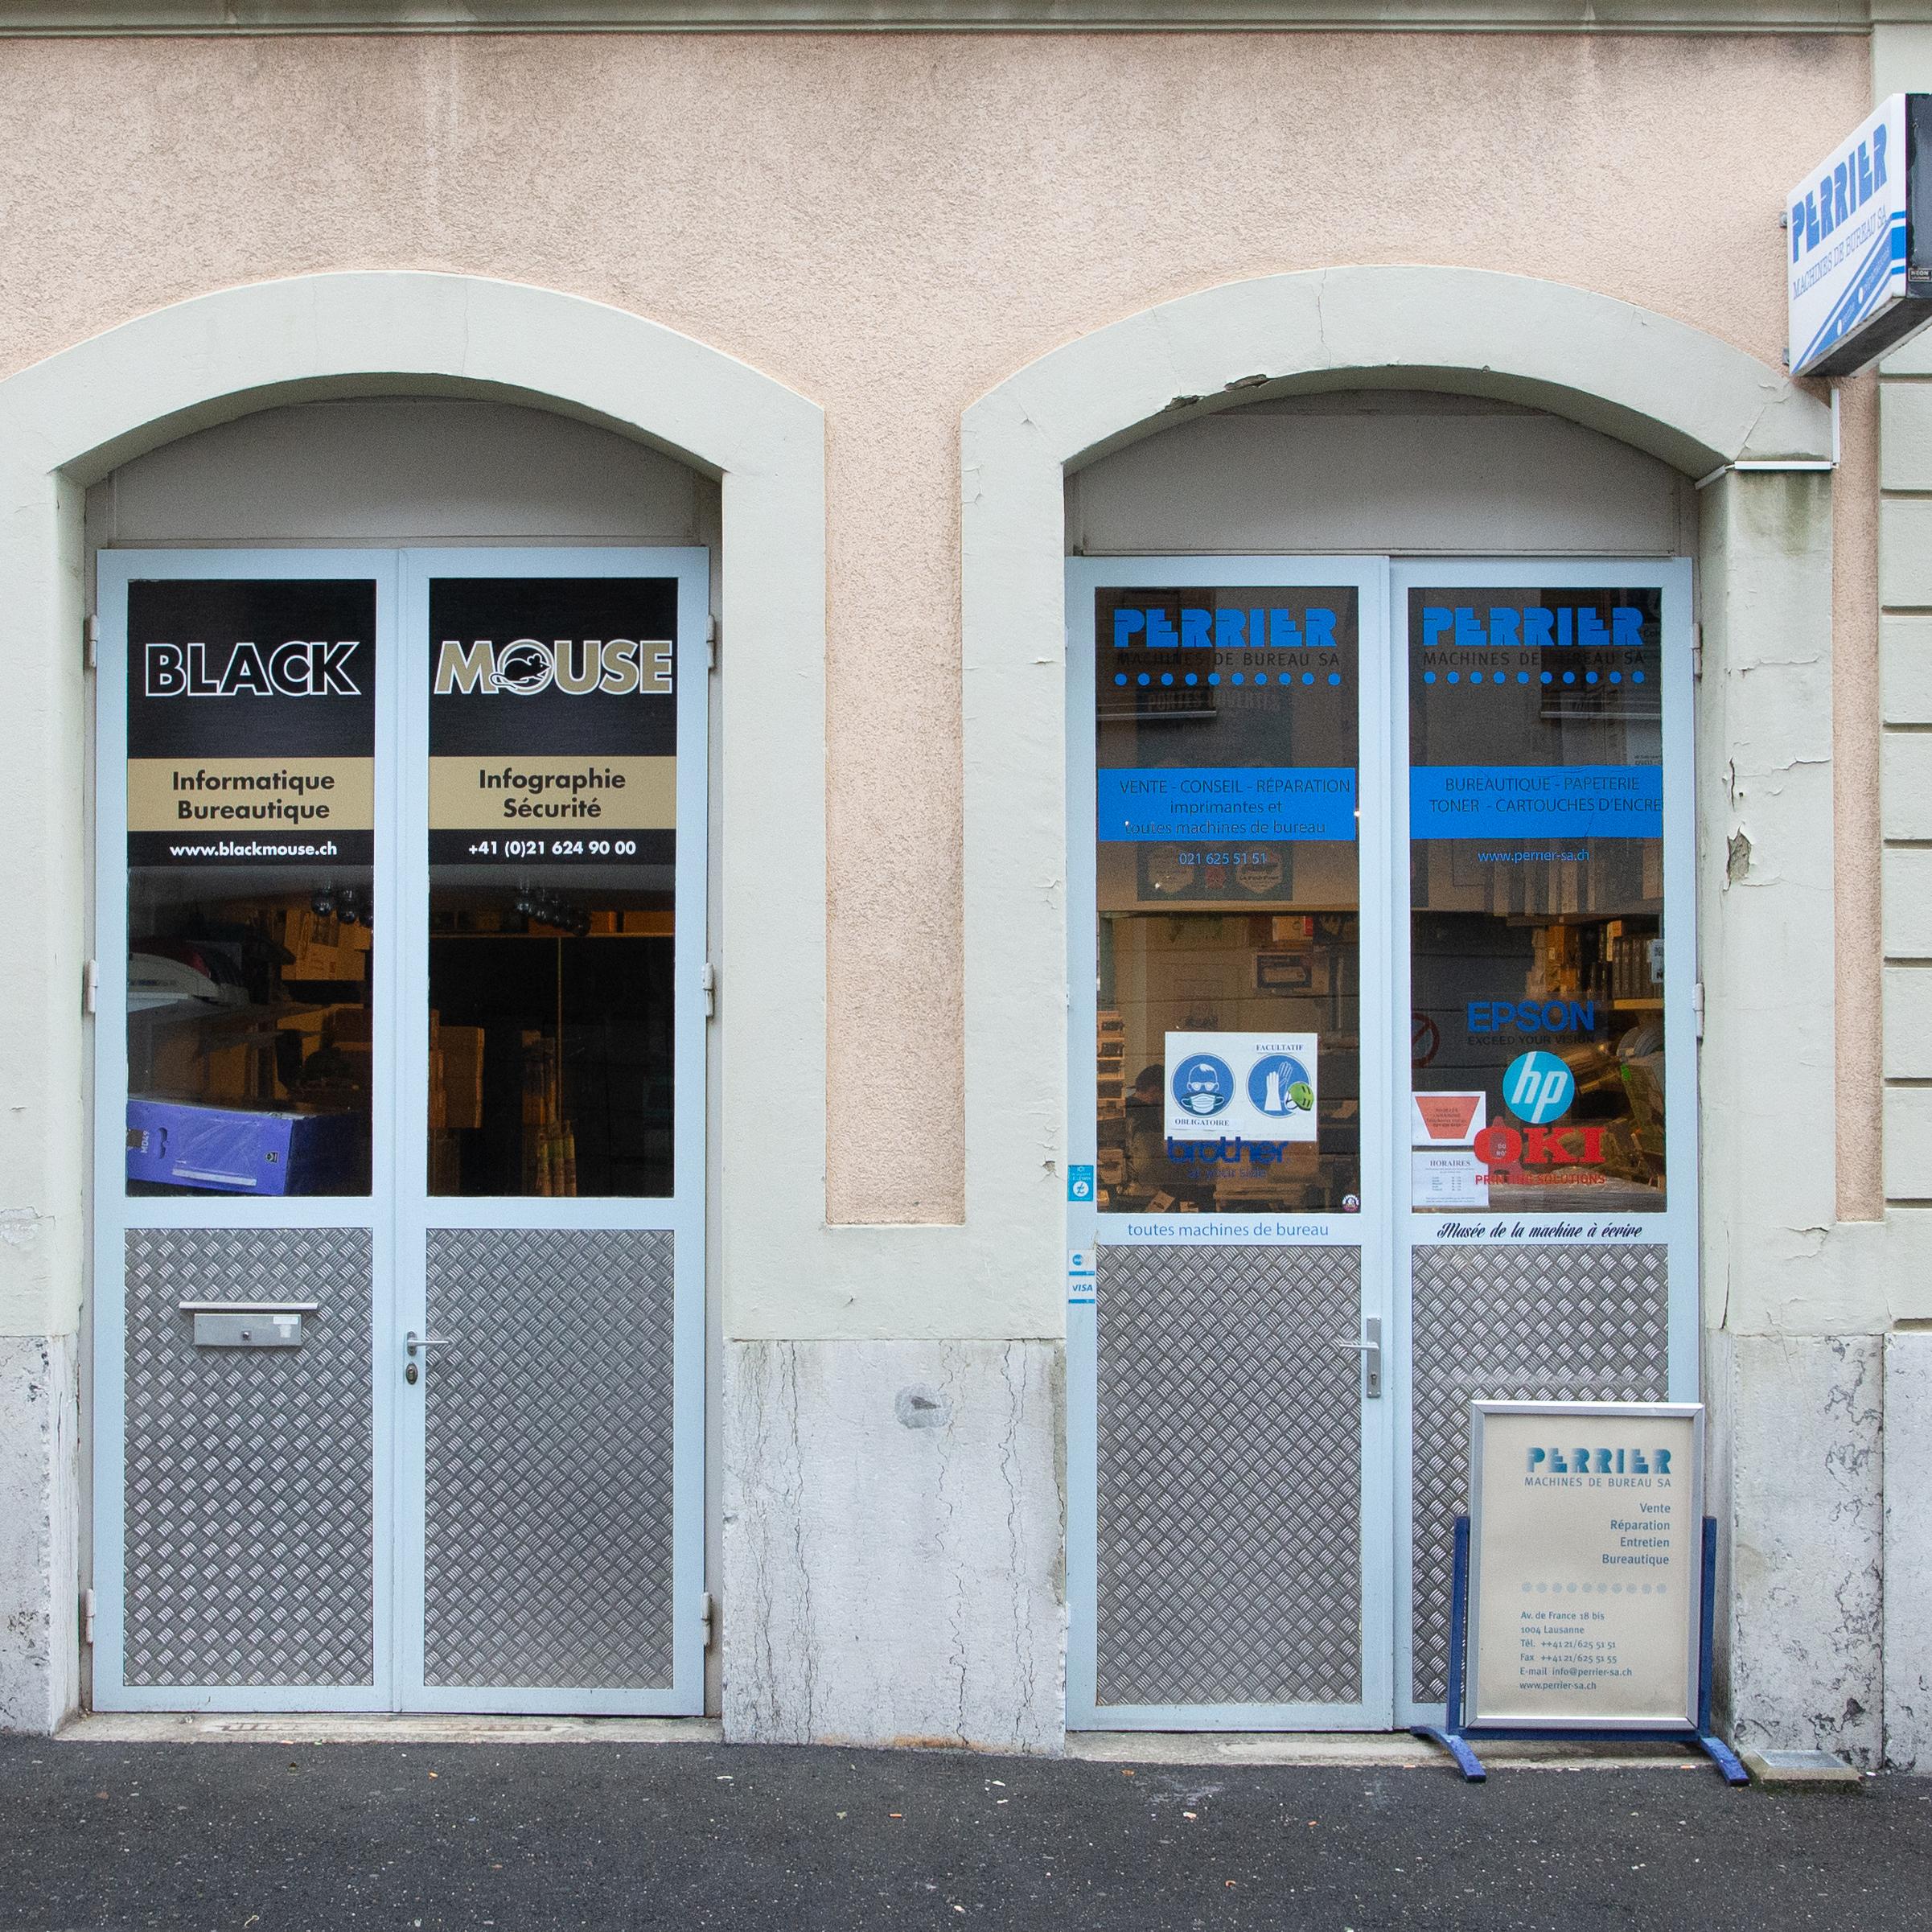 Perrier_Machines_de_Bureau_1[1]